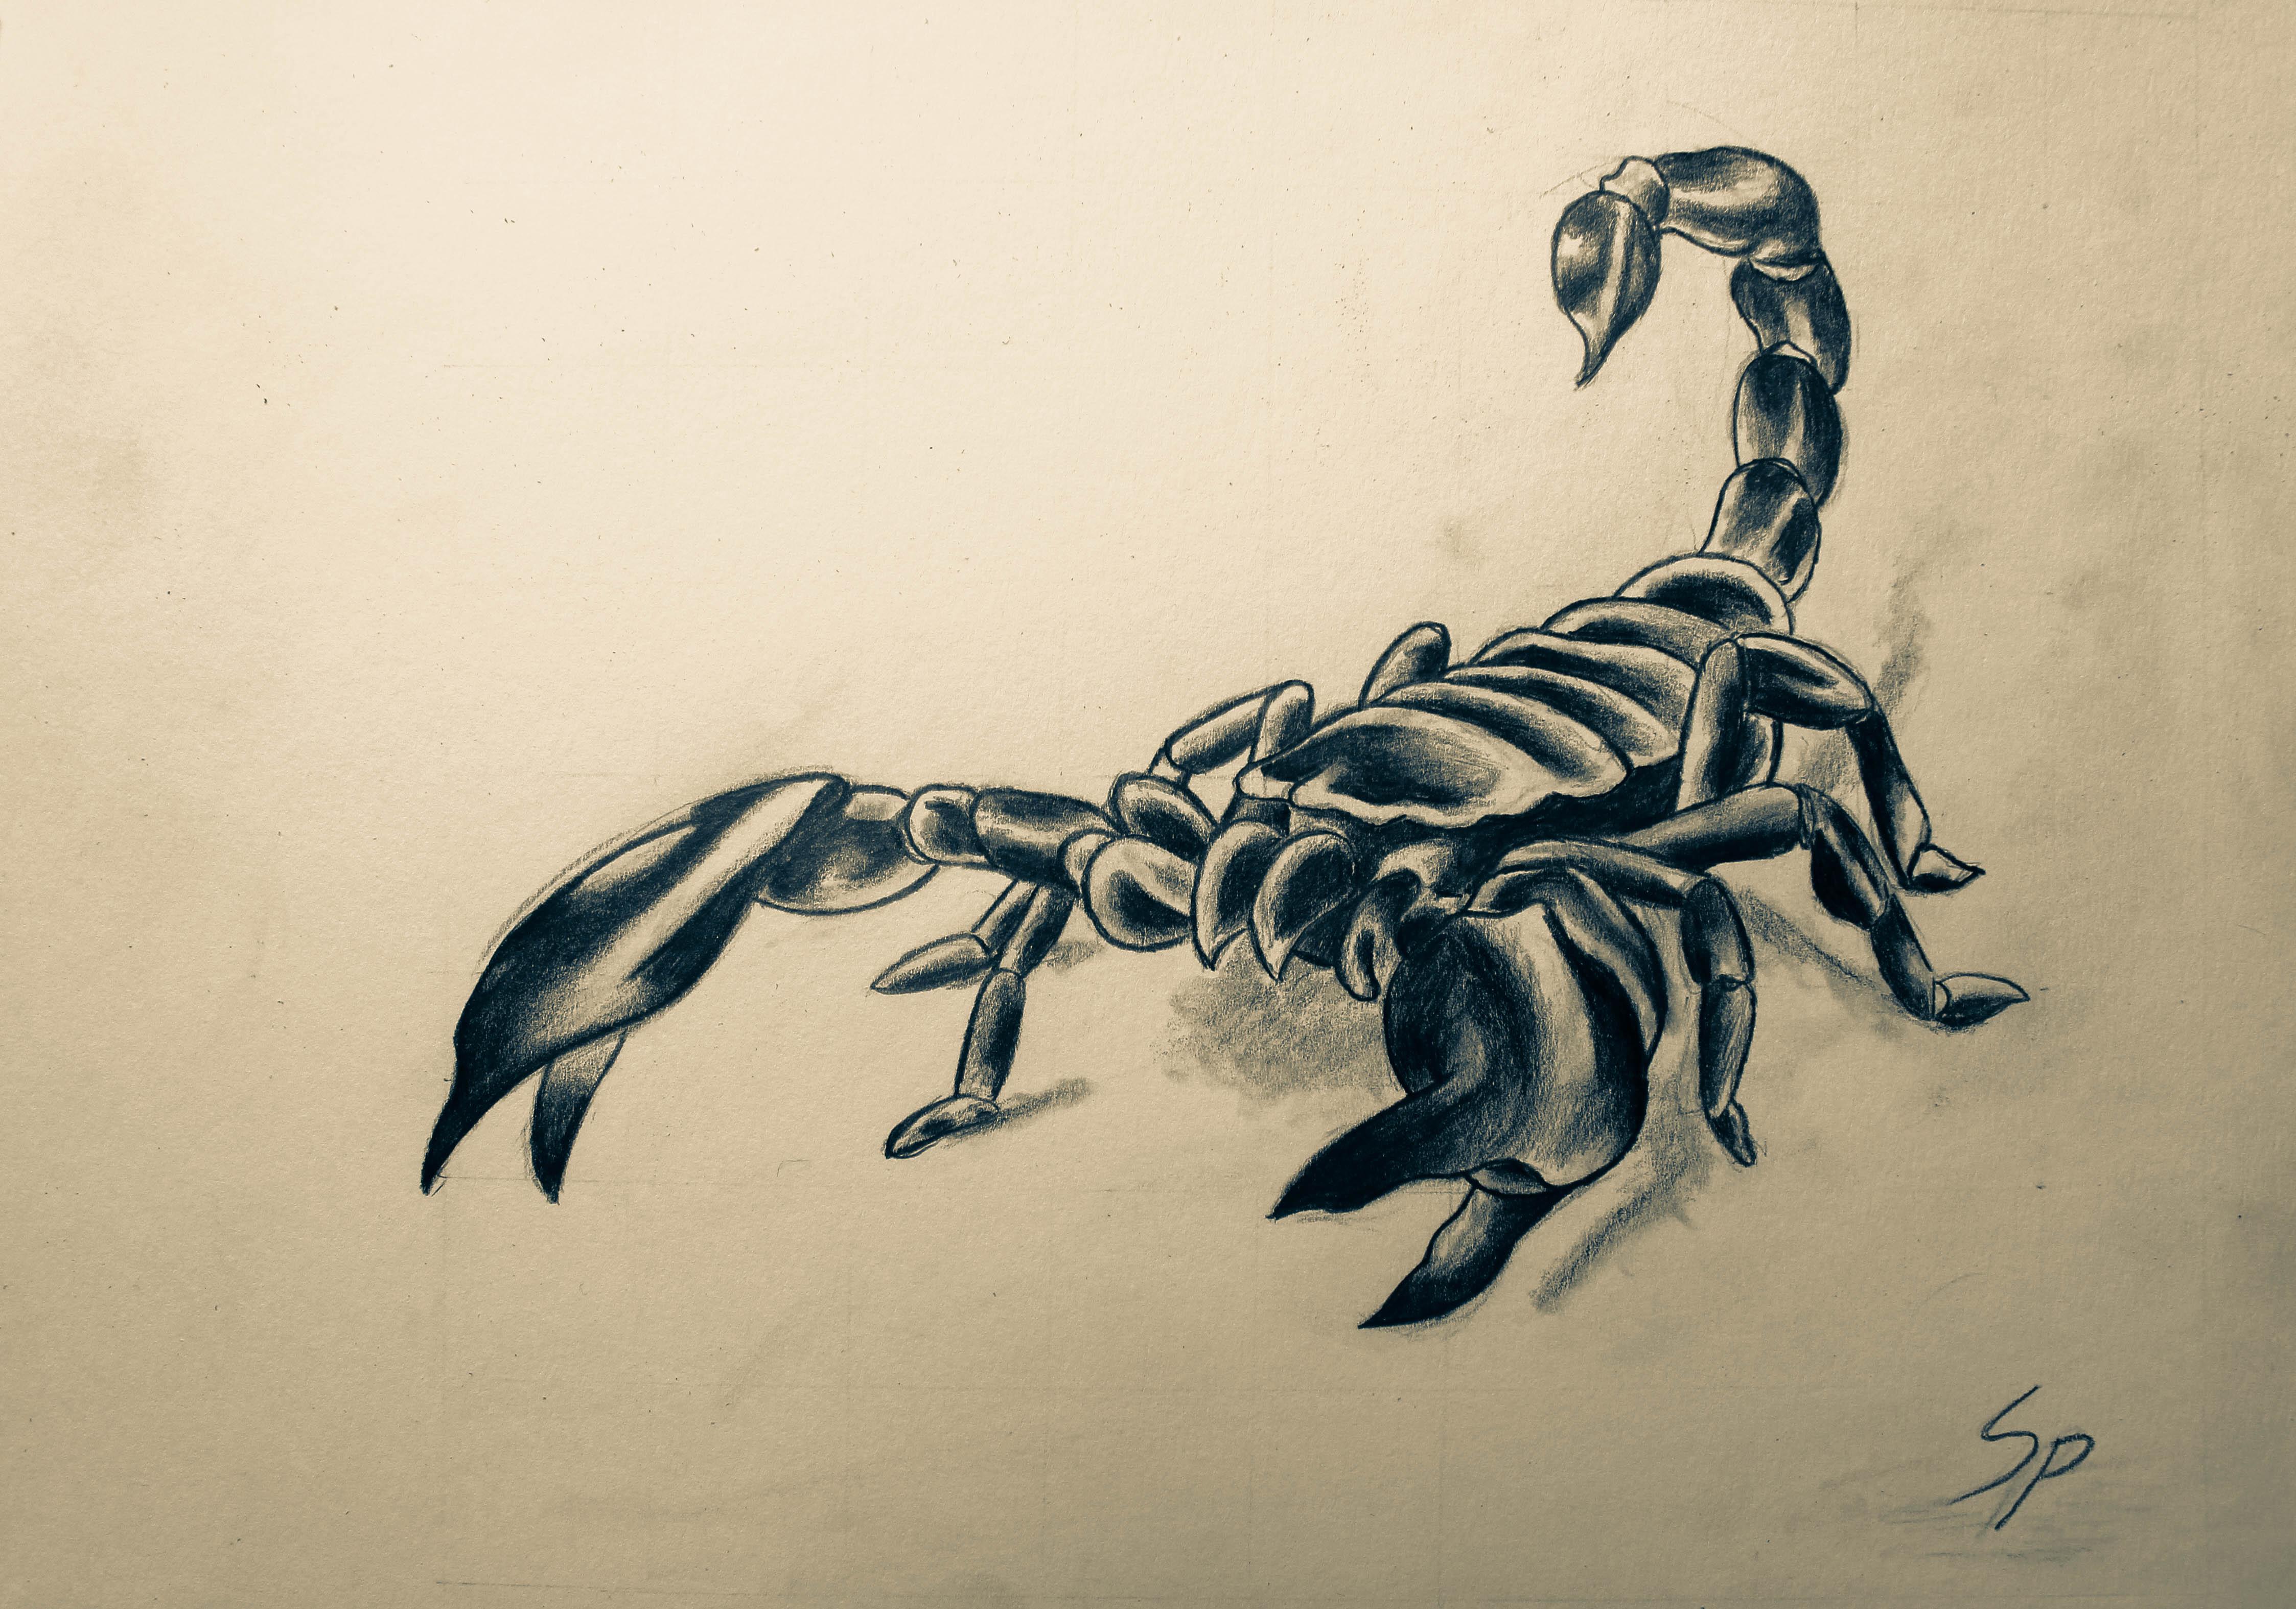 Scorpion King Tattoo Design